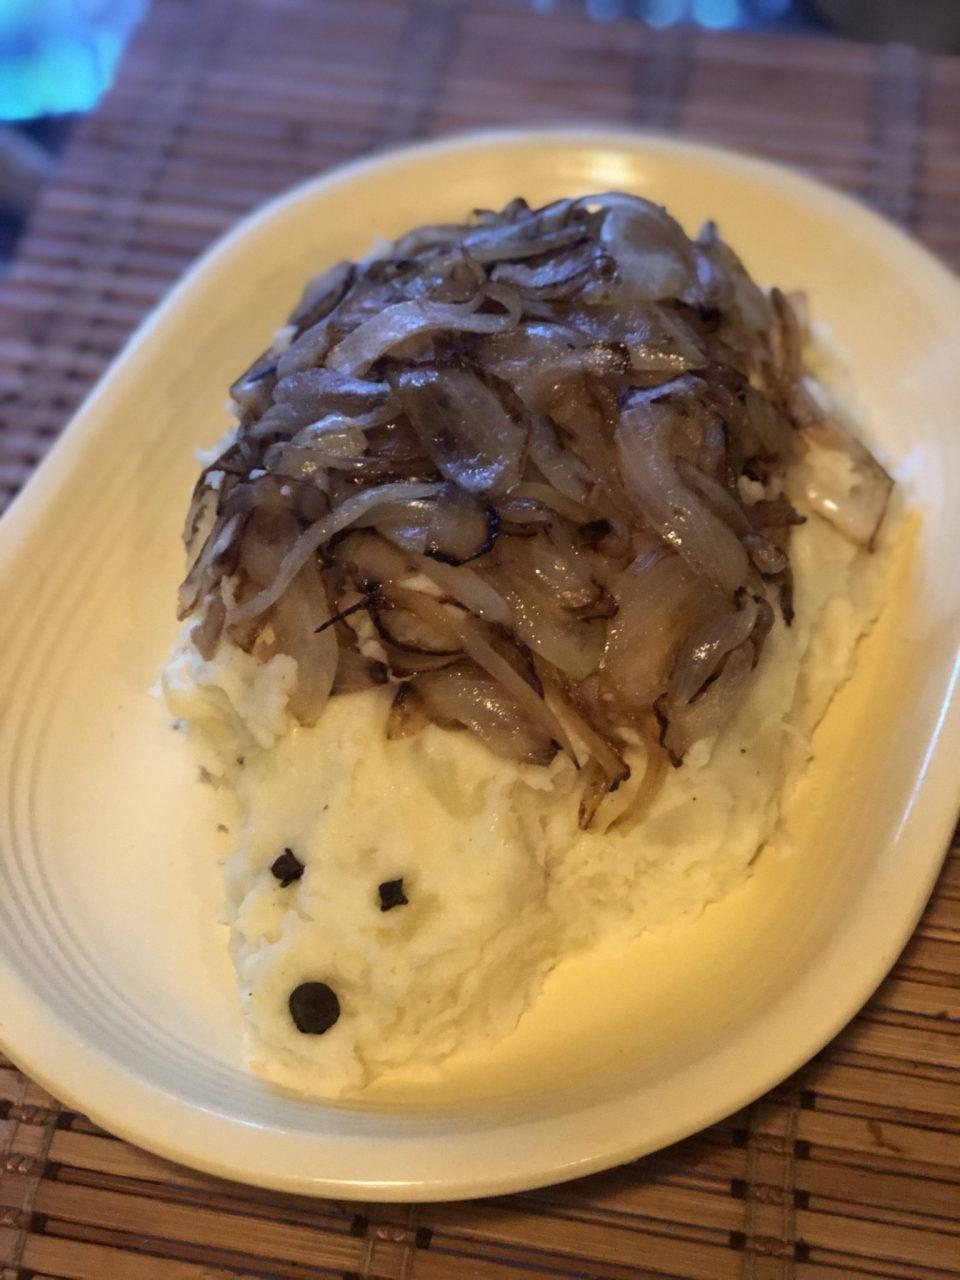 My Mother's Hedgehog mashed Potato